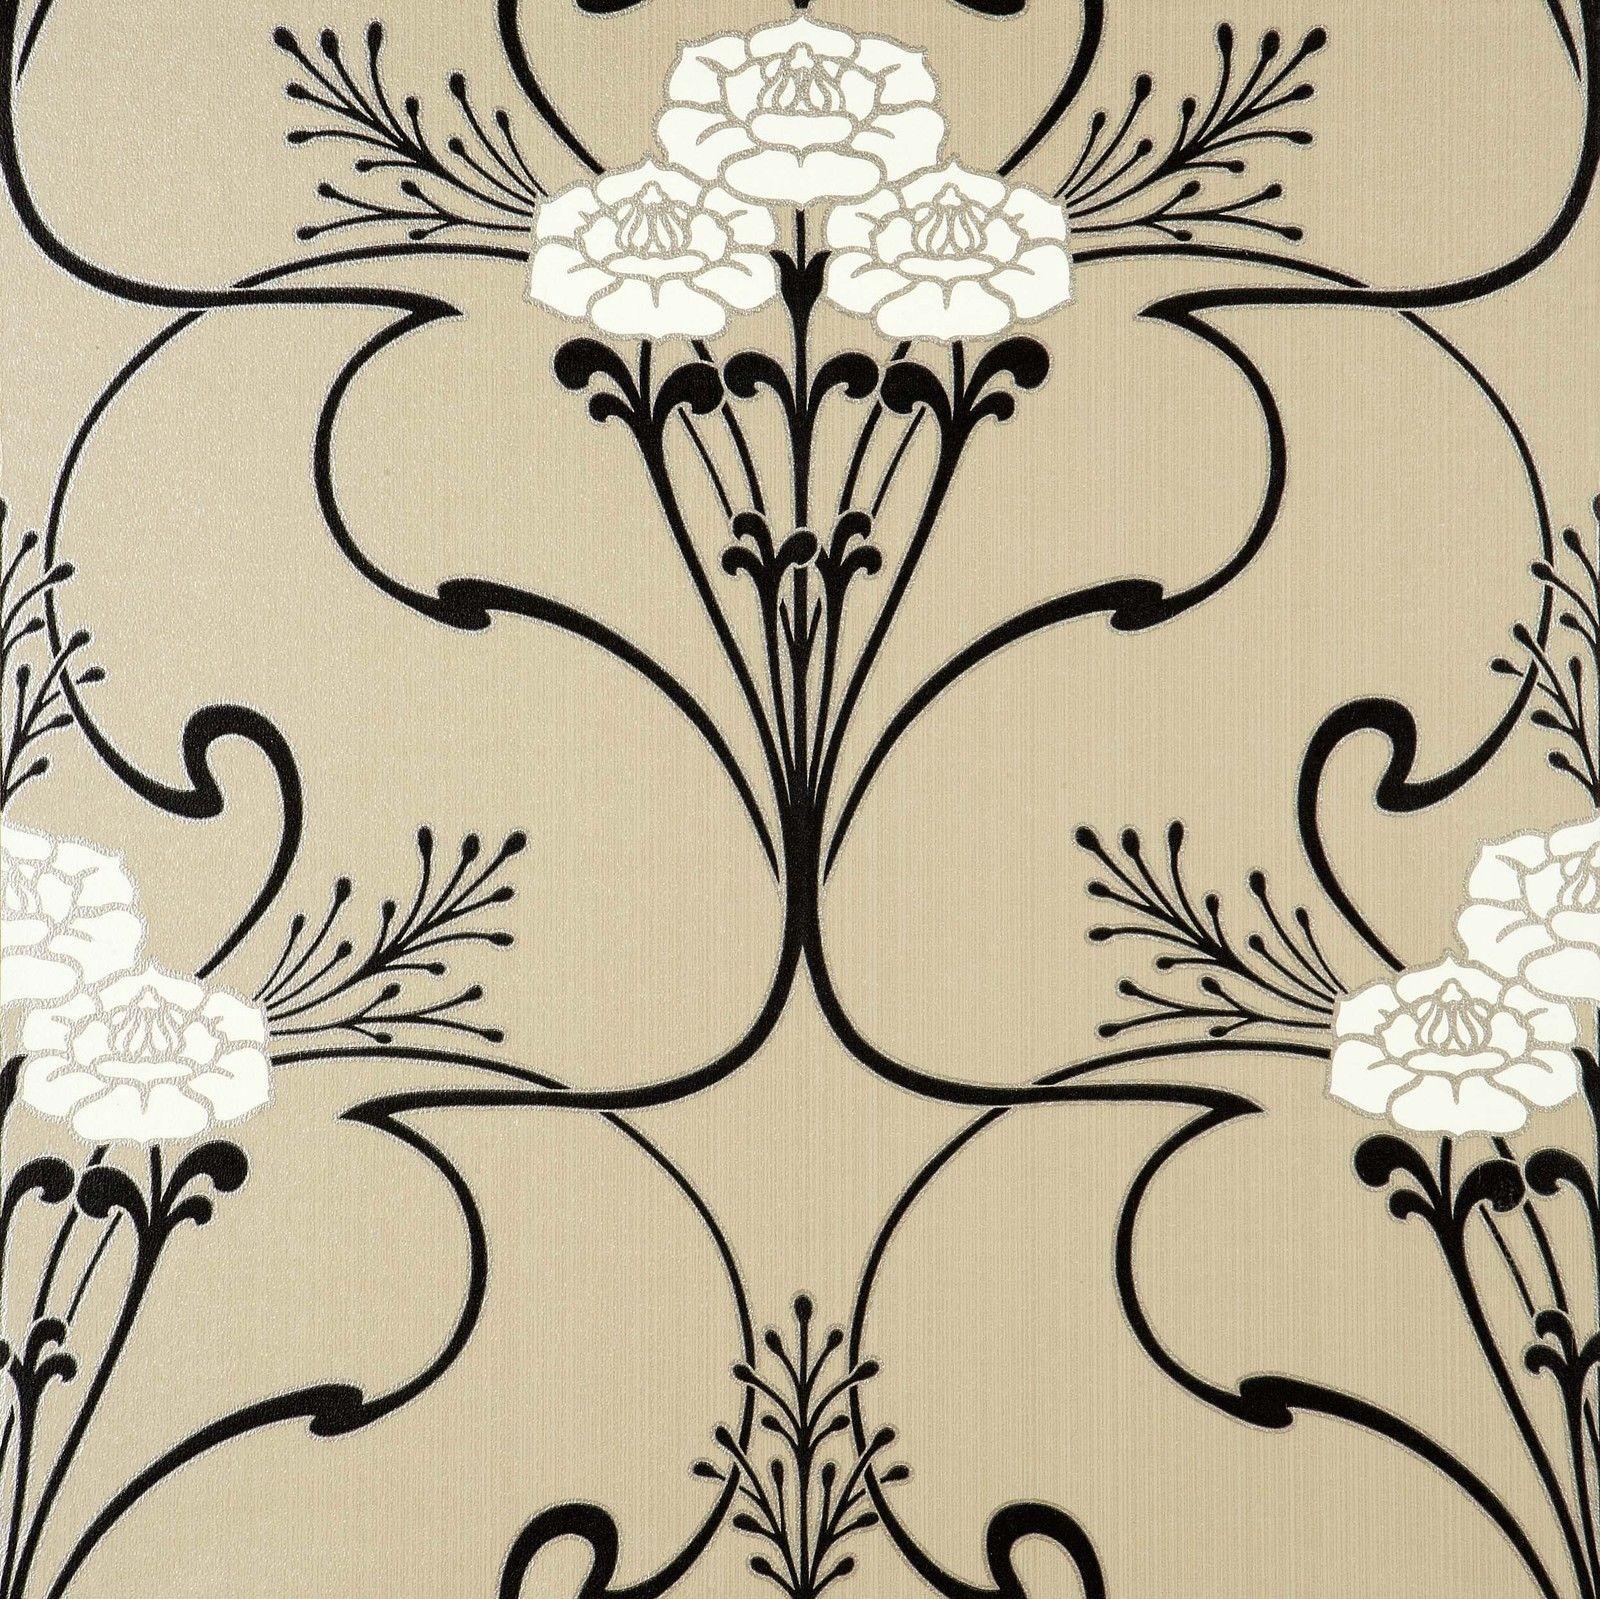 Free Download Flower Vine Art Deco Style Wallpaper In Beige White